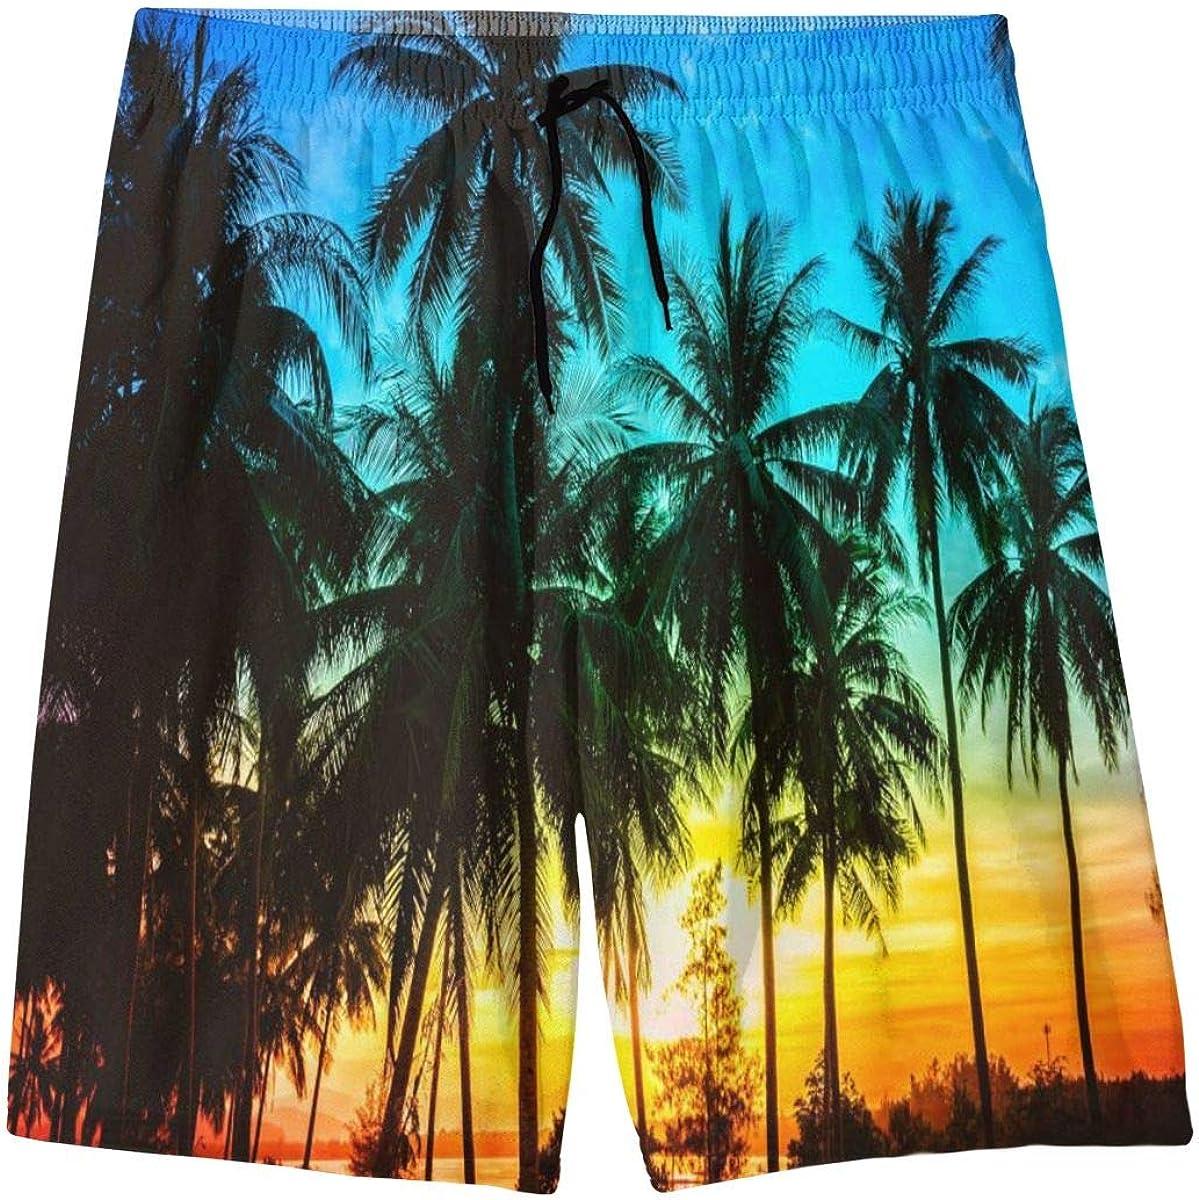 FeHuew Colorful Palm Tree Teens Swim Trunks 20